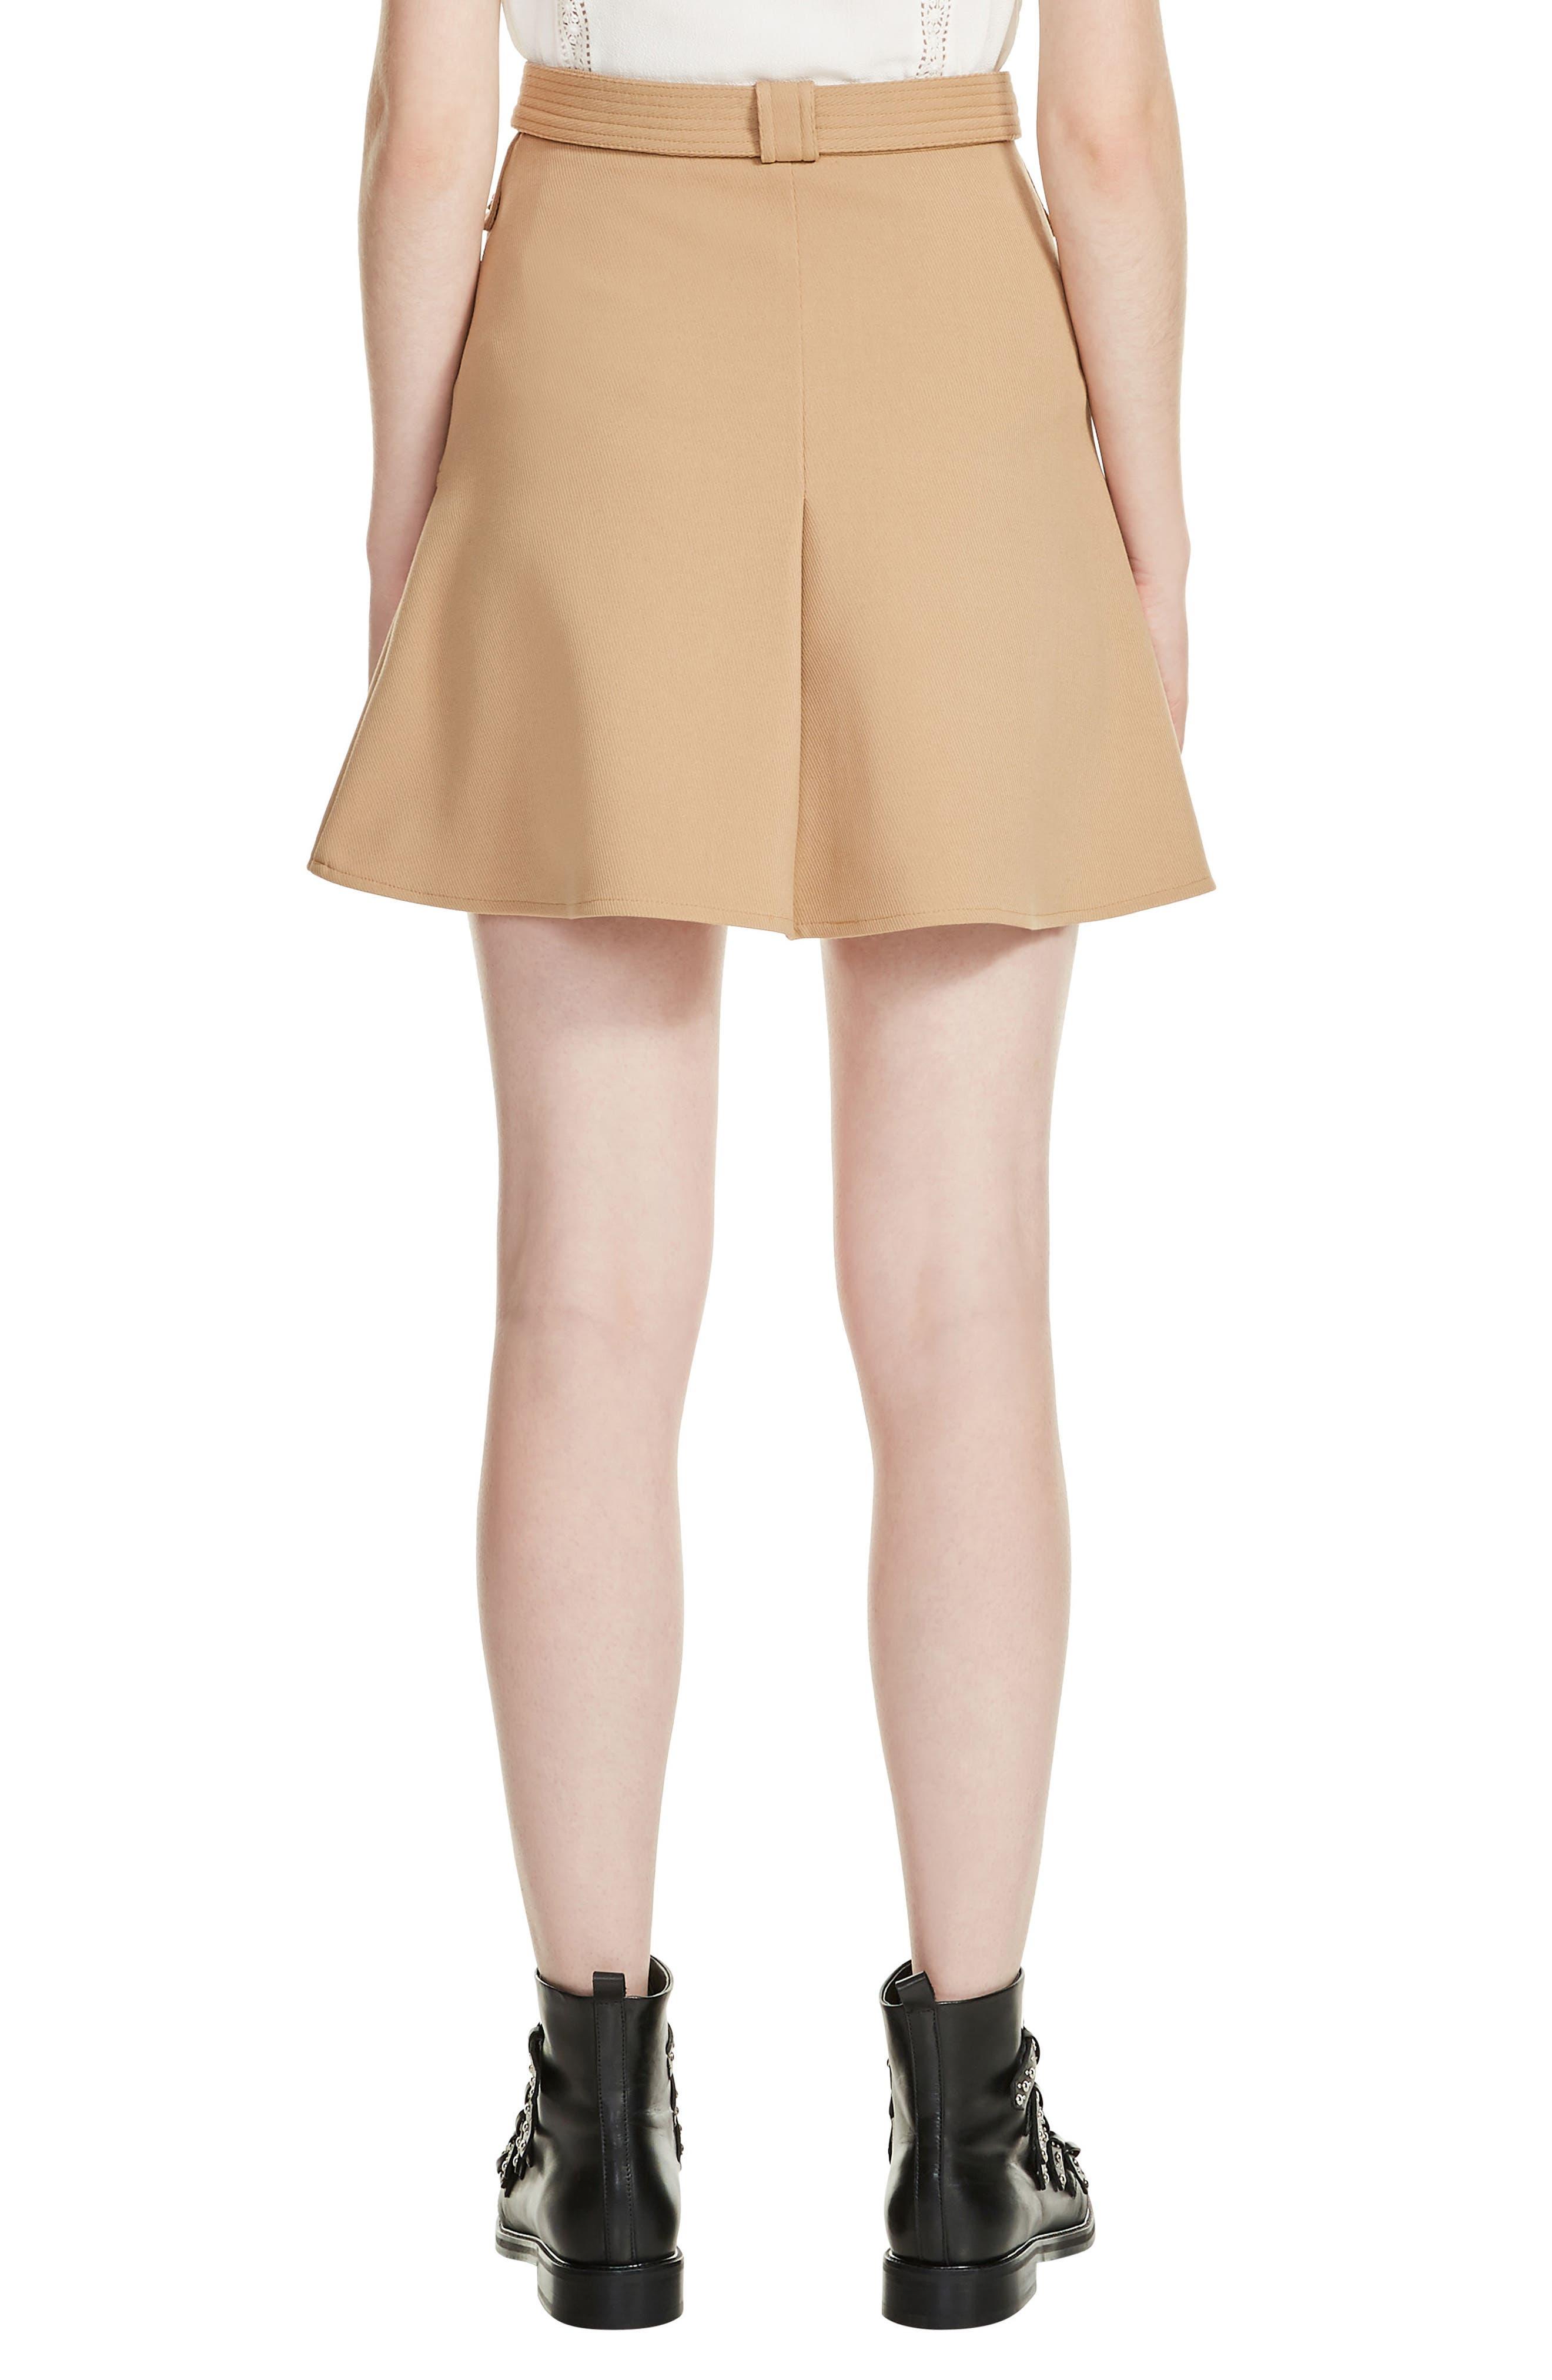 Jelsi Miniskirt,                             Alternate thumbnail 2, color,                             250